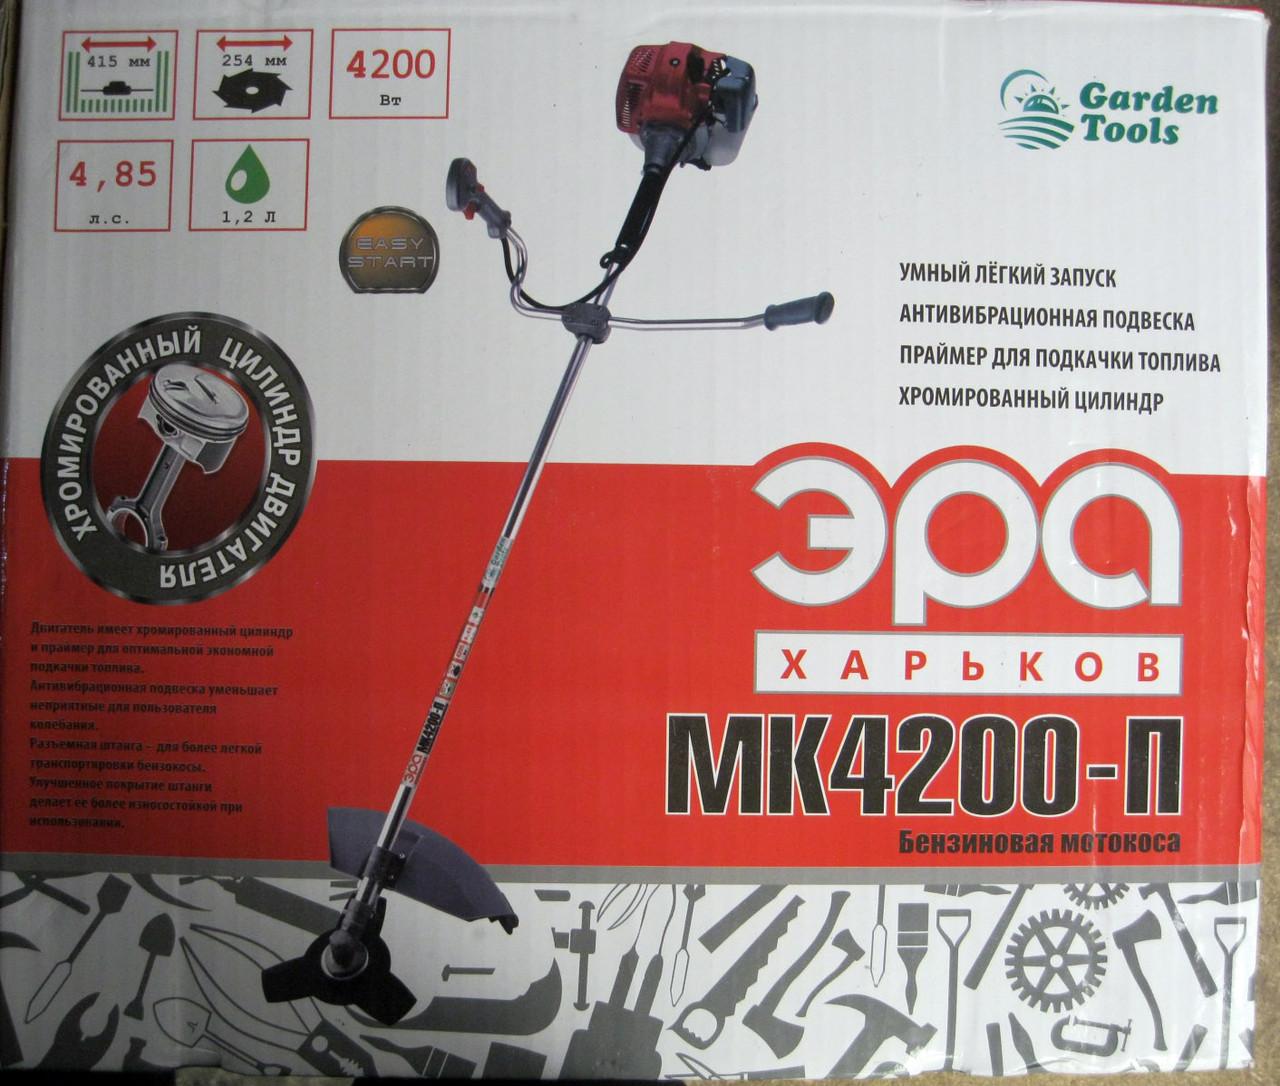 Коса бензиновая Эра МК4200-П